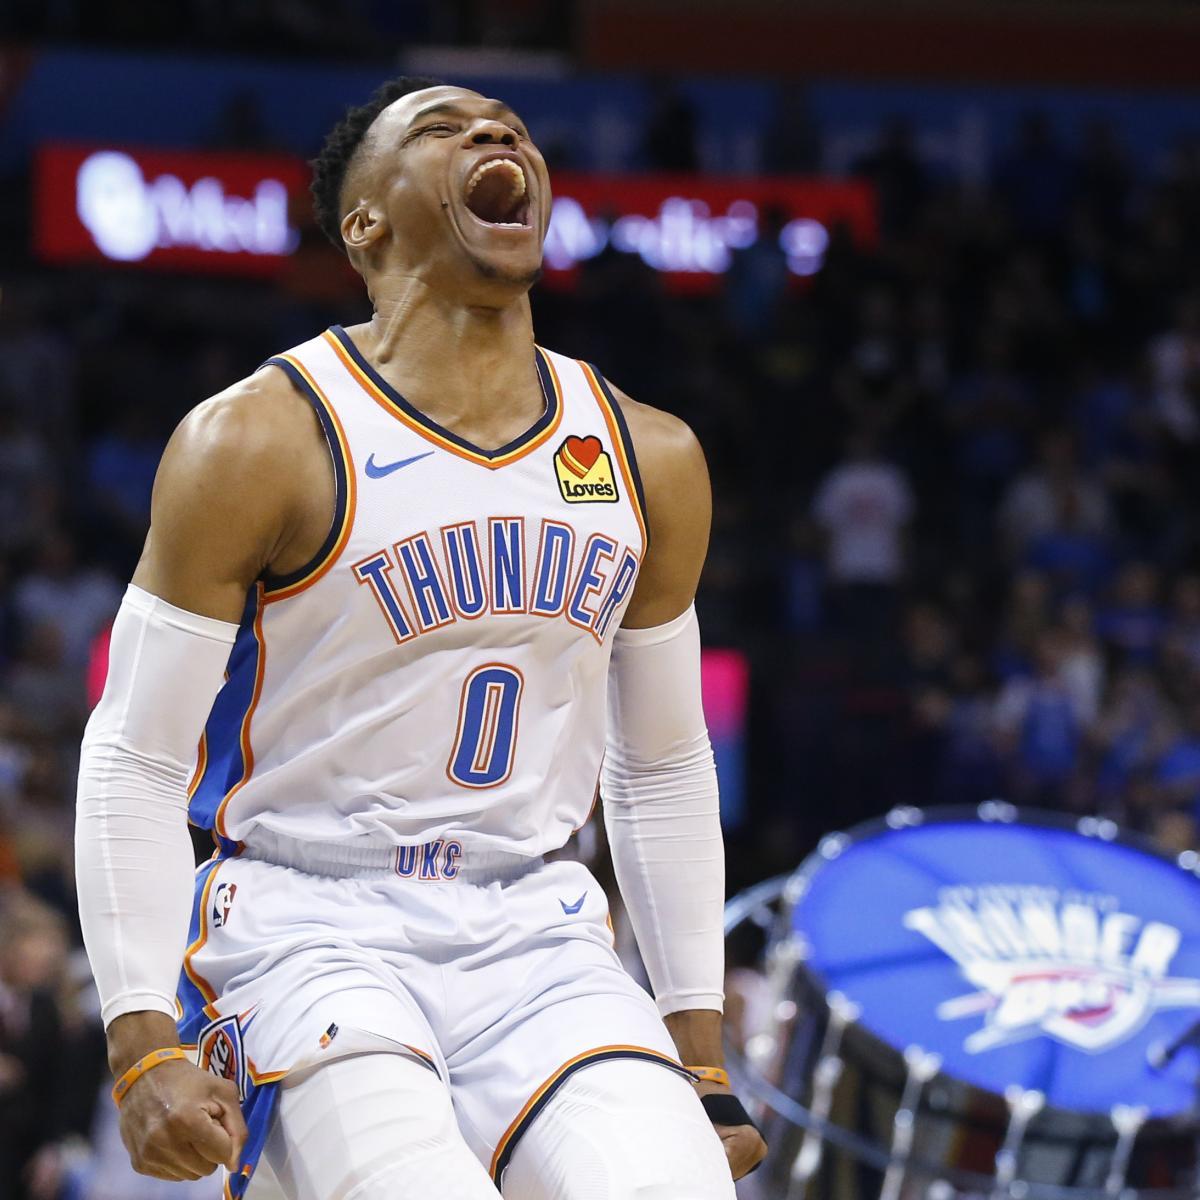 Bleacher Report Nba Staff S 2019 Playoff Predictions: NBA Playoff Bracket 2019: Full Review Of Postseason